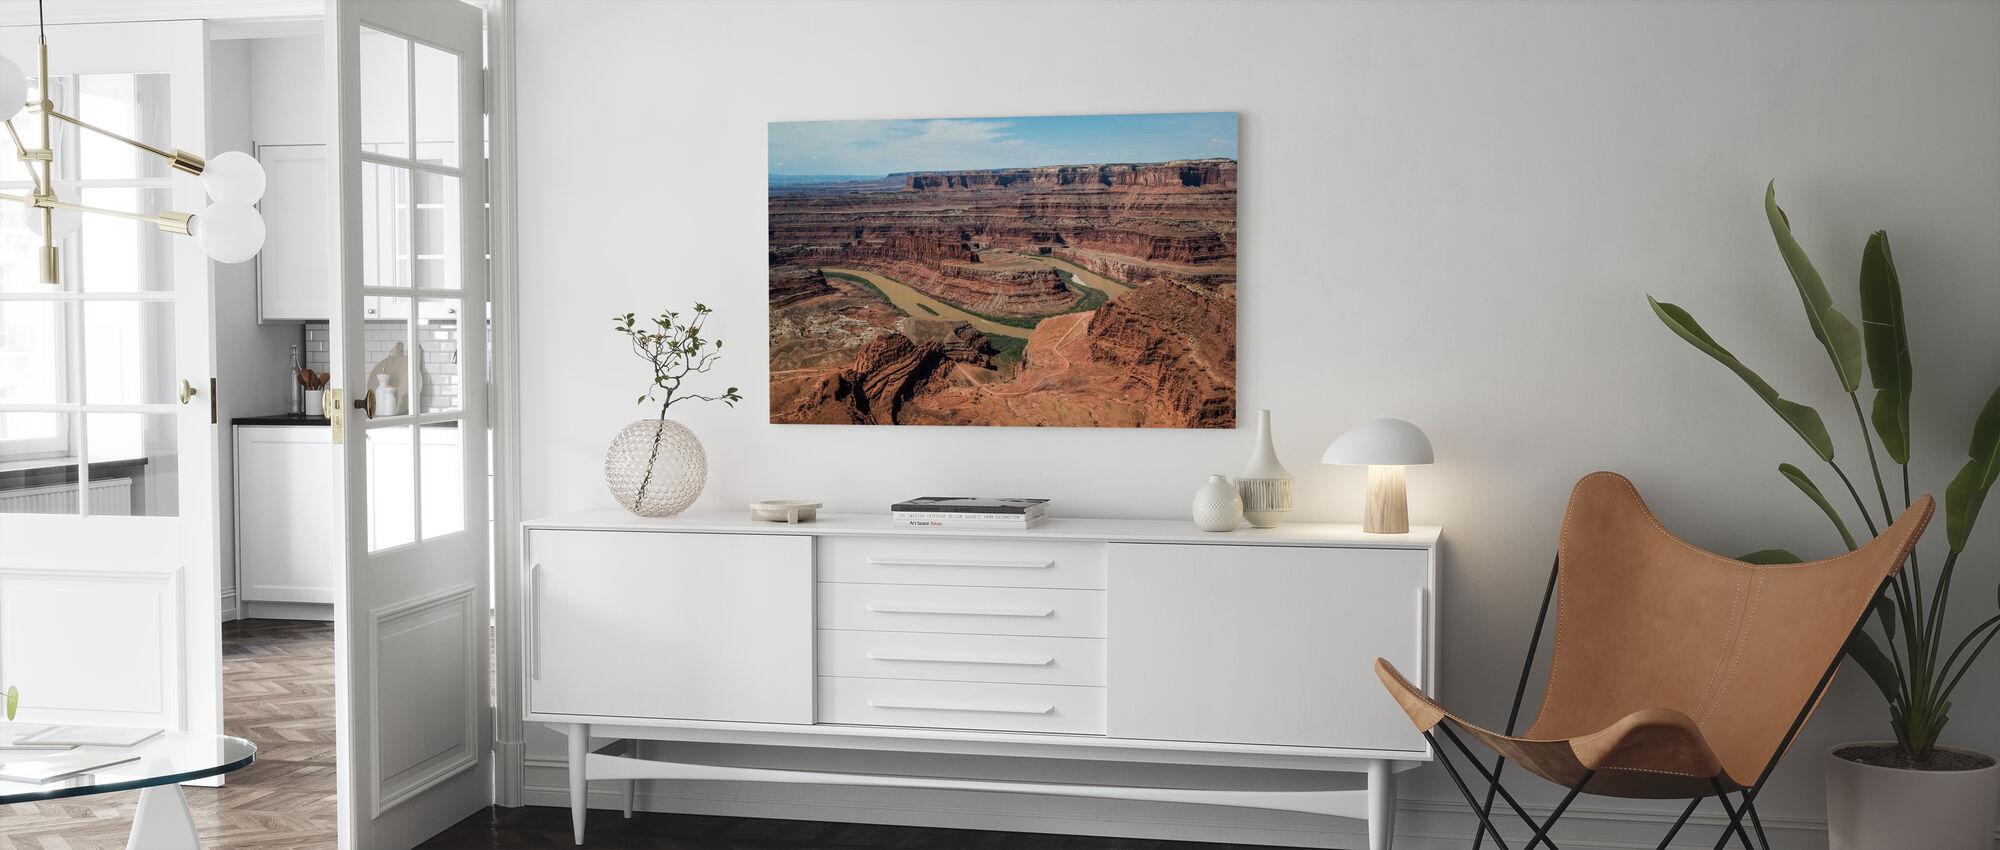 Dead Horsepoint Perspective of Gooseneck Color - Canvas print - Living Room